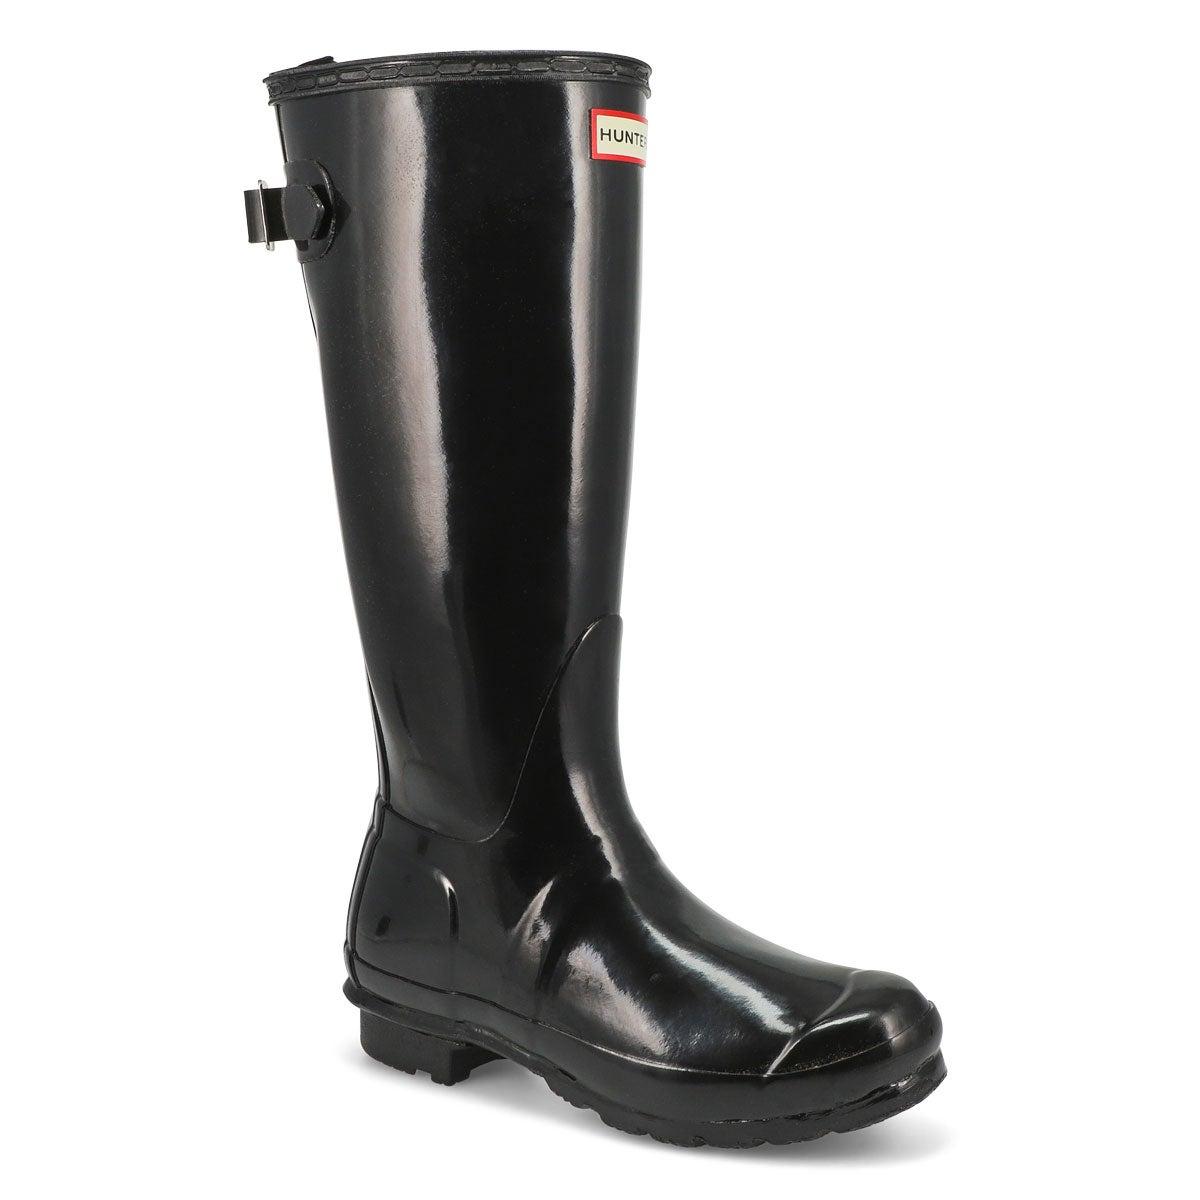 Women's ORIGINAL ADJUSTABLE GLOSS black rain boots